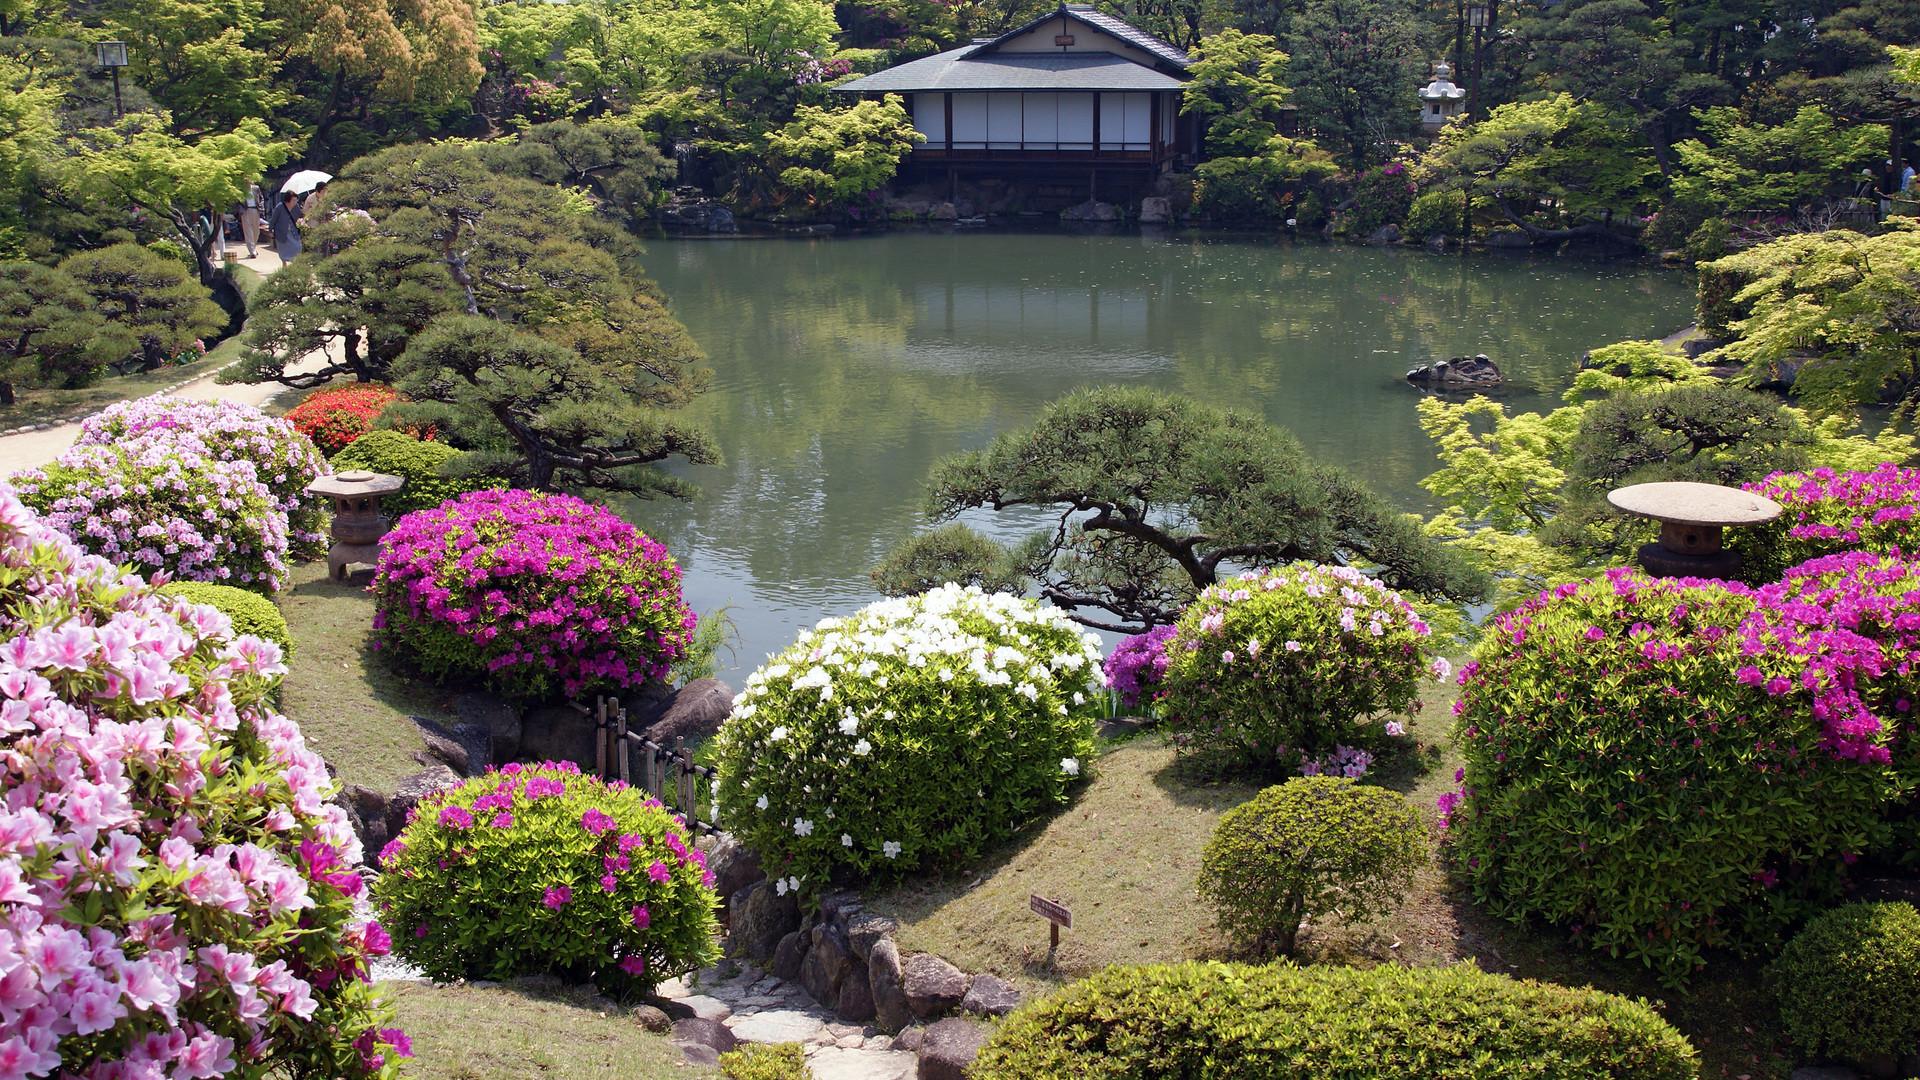 1920x1080 Lovely Zen Garden Wallpaper 2695